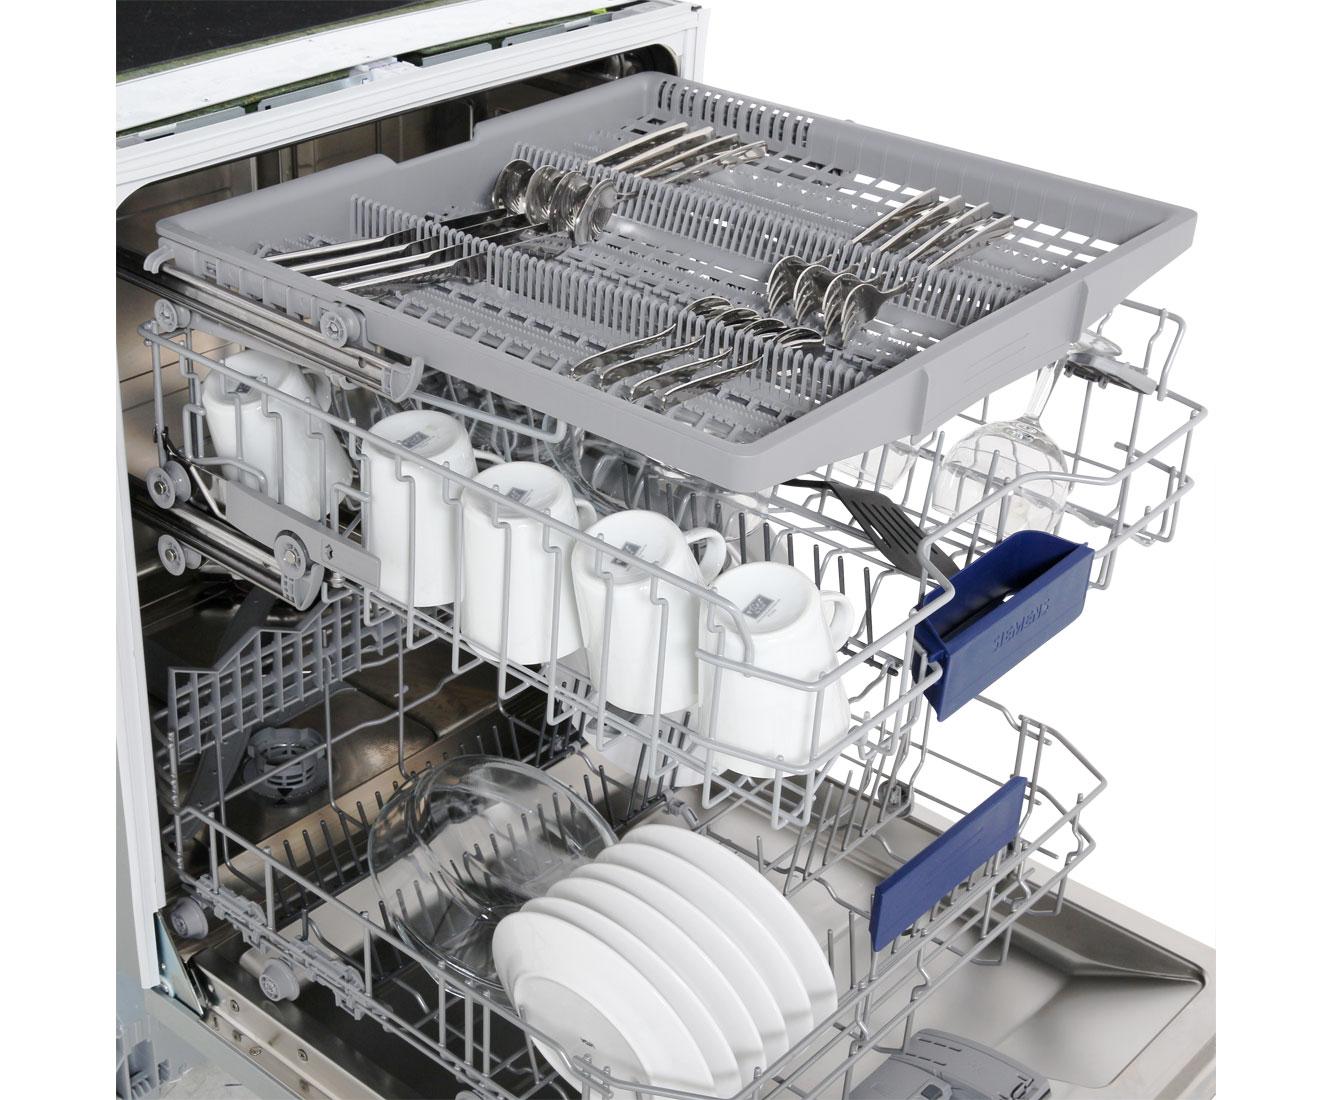 Bosch Geschirrspuler Besteckschublade Richtig Einraumen Bosch Sps